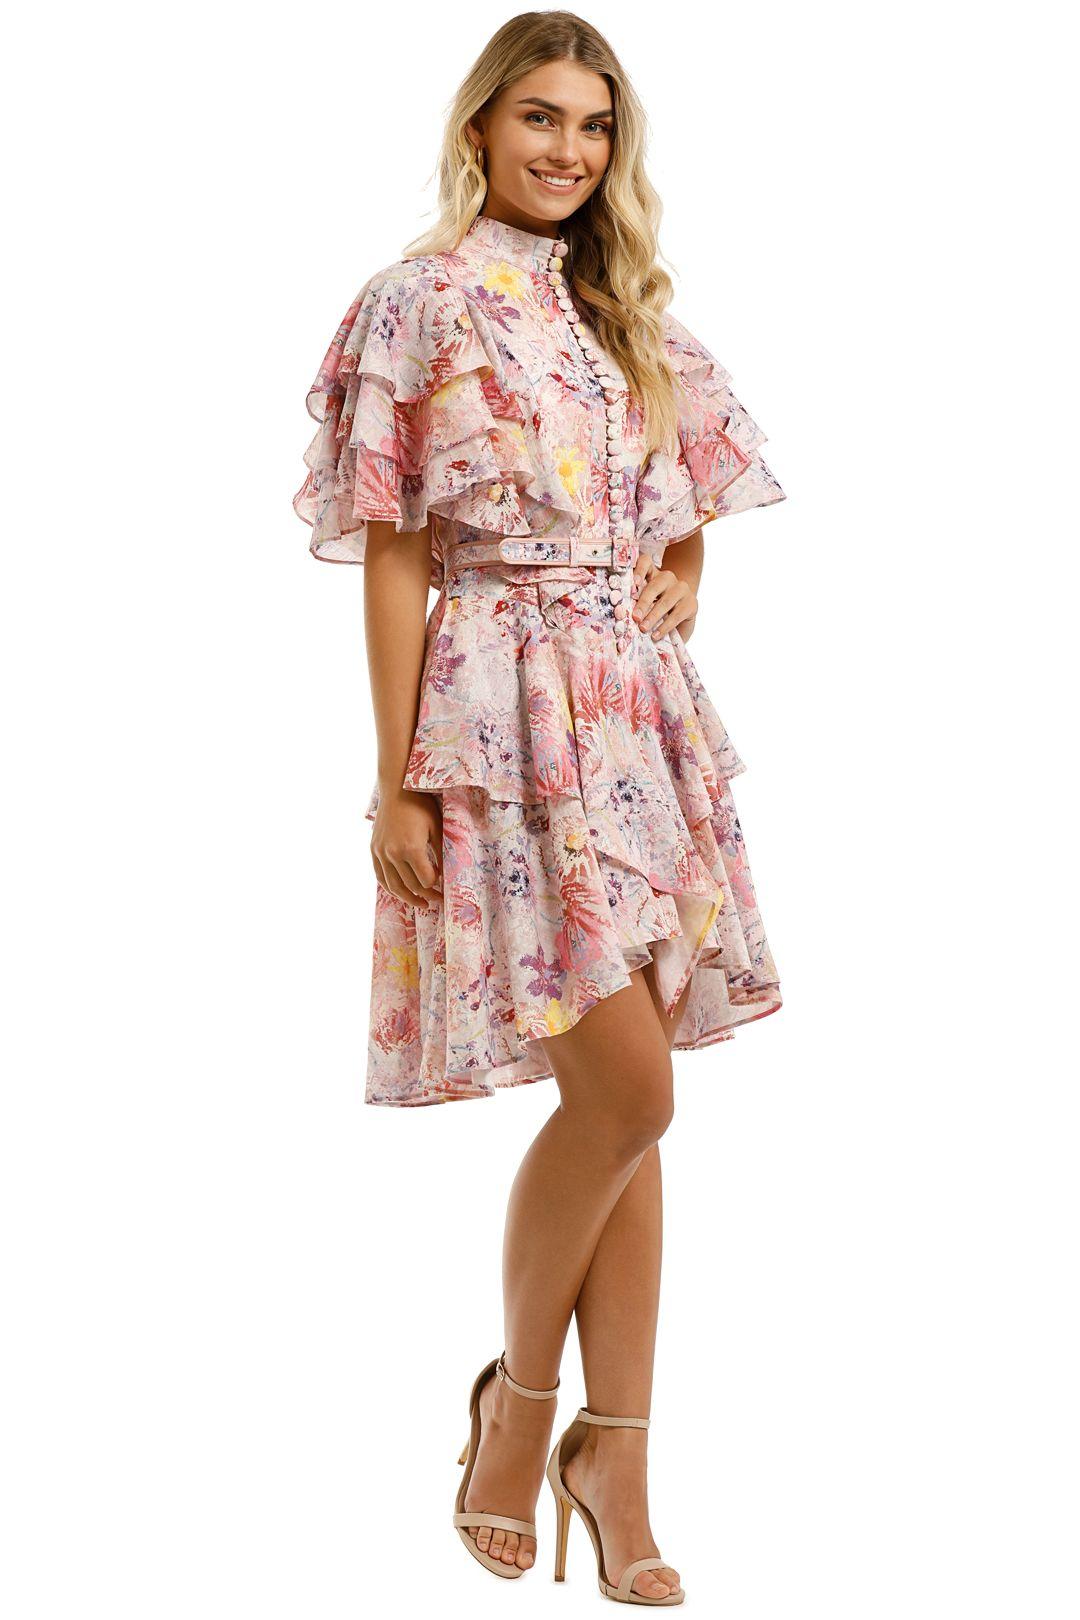 Leo-and-Lin-Euphoria-Cotton-Linen-Ruffled-Mini-Dress-Blush-Side